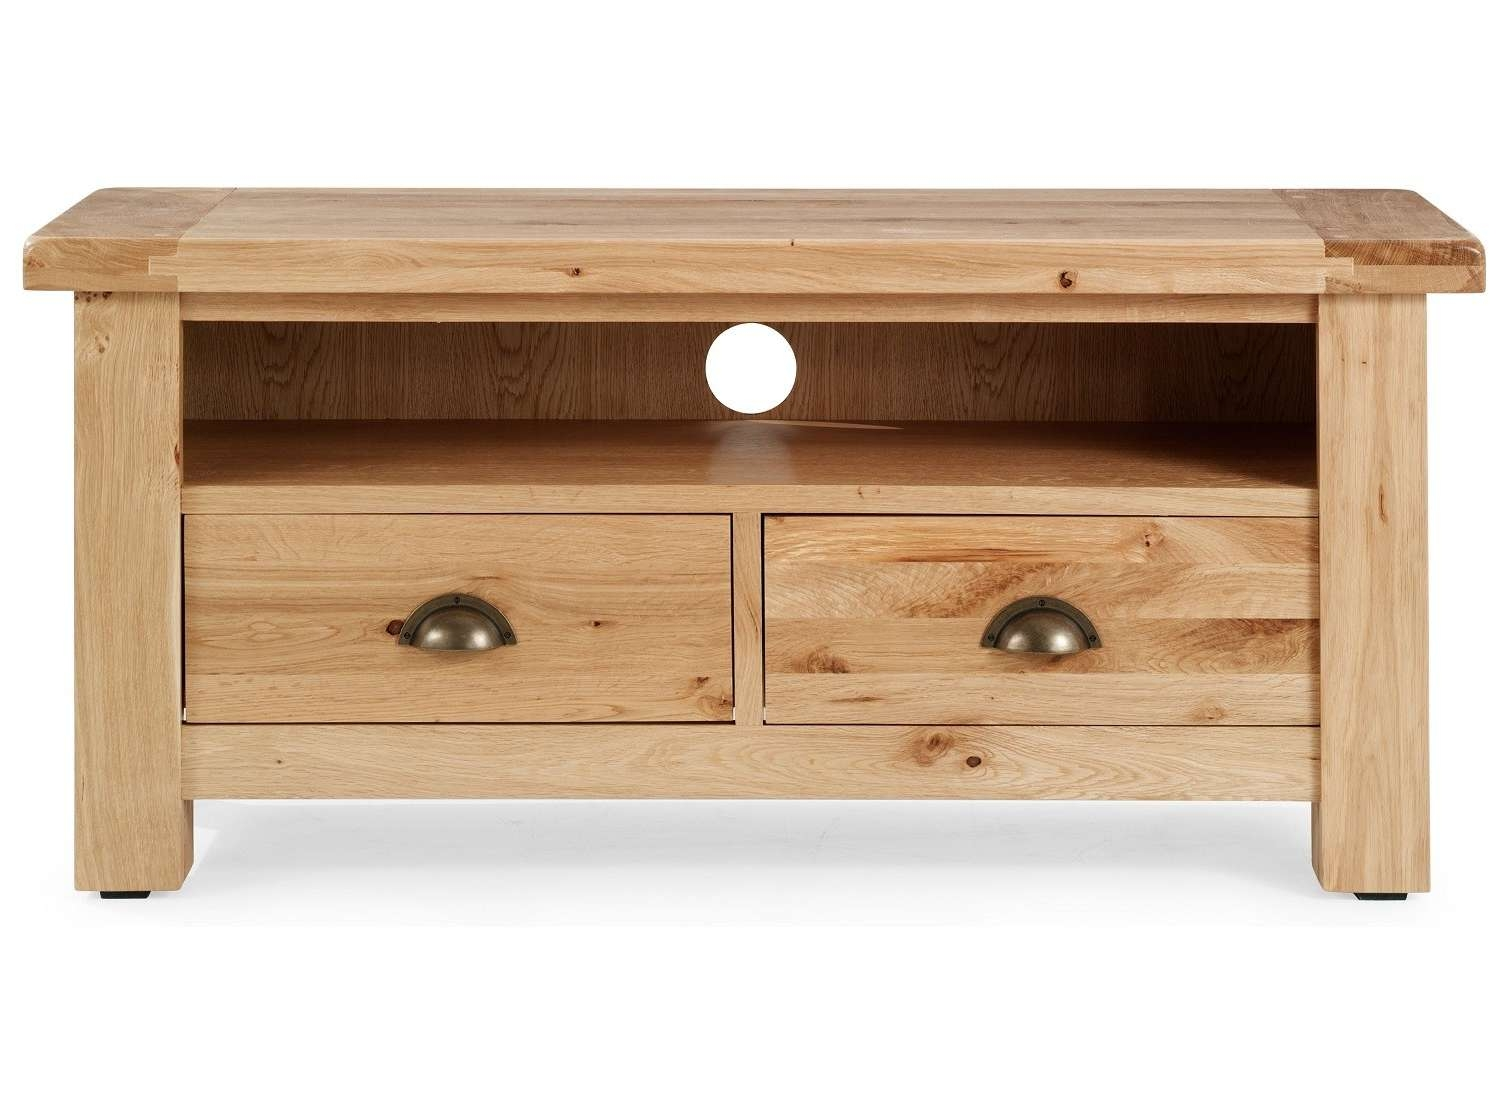 Normandy Rustic French Oak Tv Cabinet | Oak Furniture Uk Inside Light Oak Tv Cabinets (View 13 of 20)